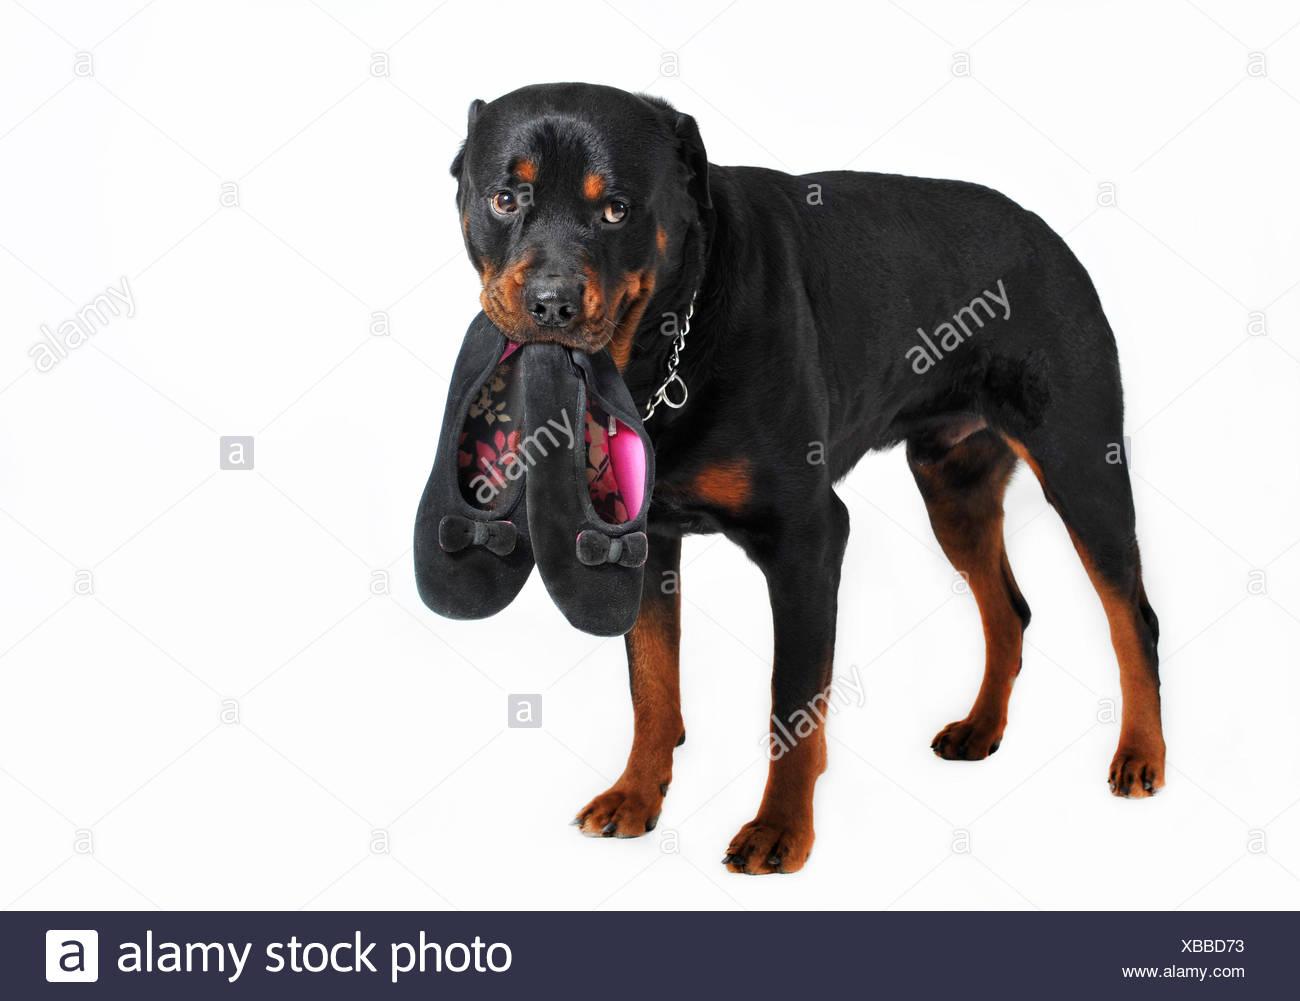 pet dog slippers - Stock Image